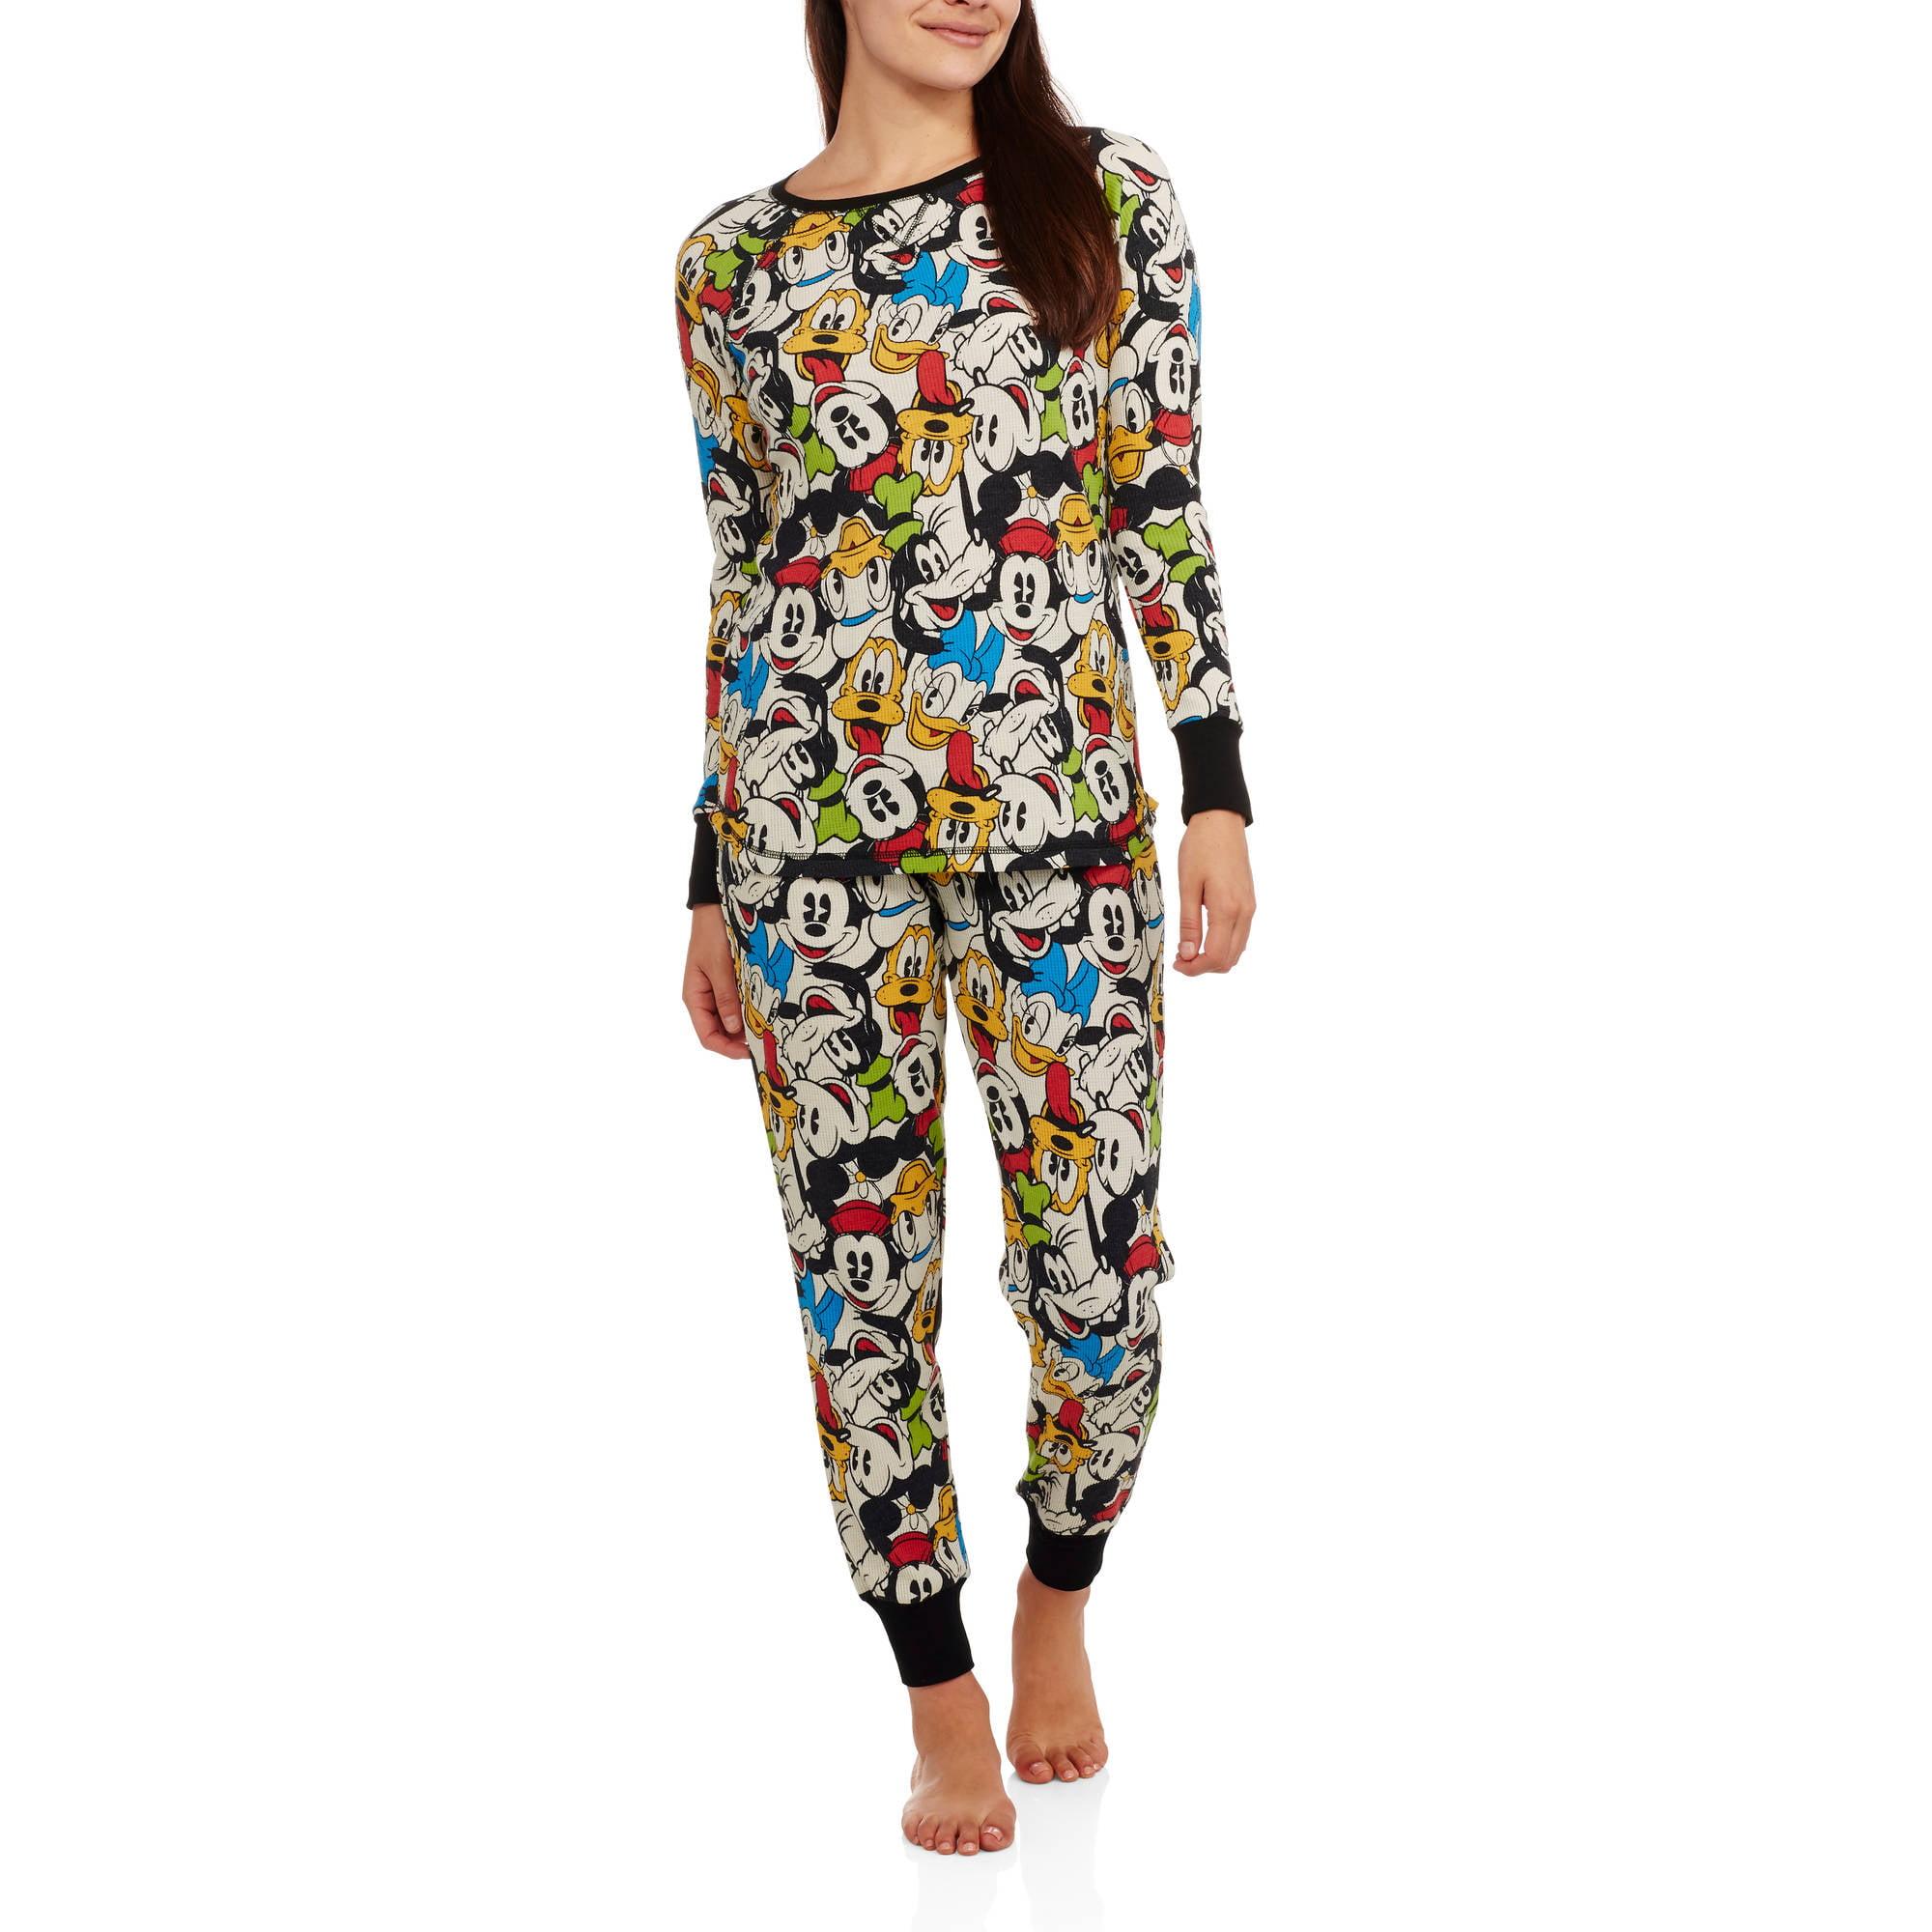 Mickey & Minnie Women's License Pajama Thermal Sleep Top and Pant 2 Piece Sleepwear Set